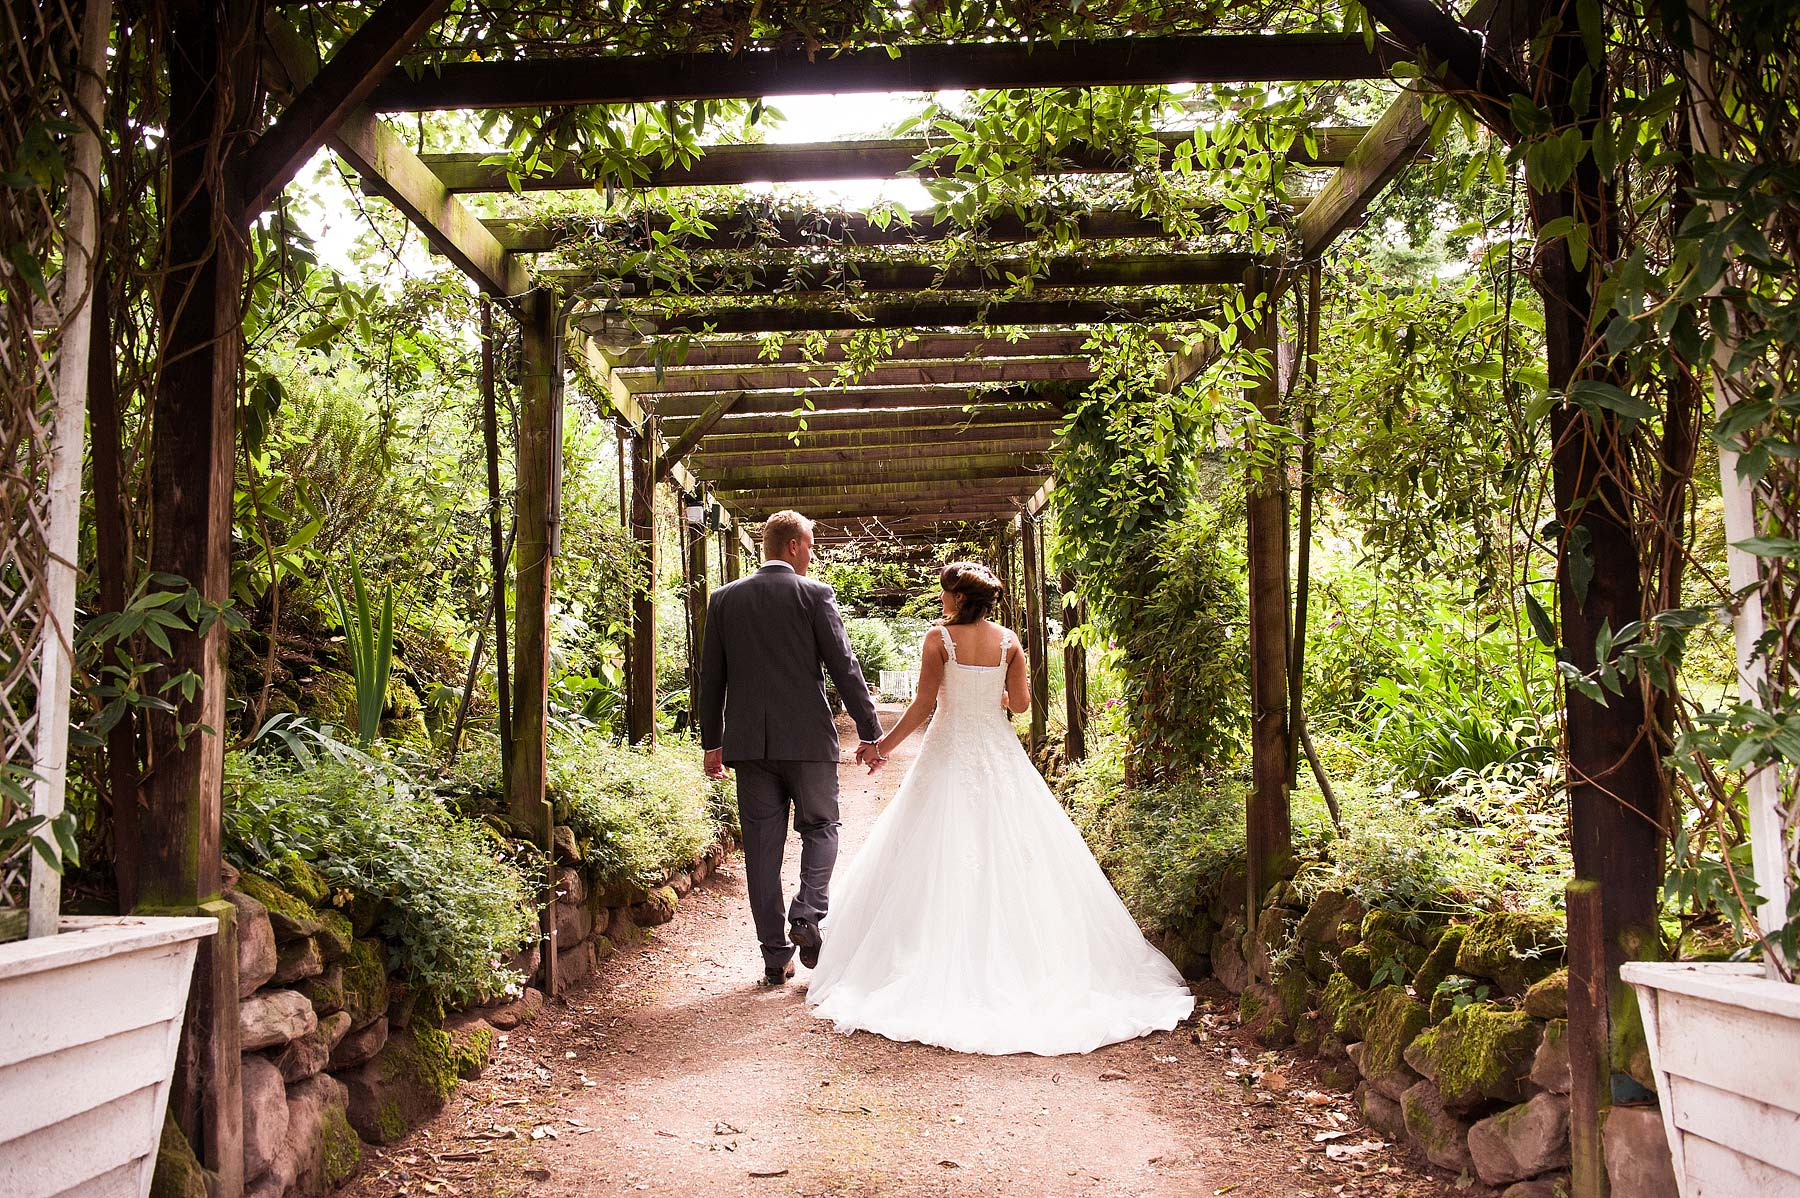 hawkesyard-estate-wedding-photographers-rugeley-062